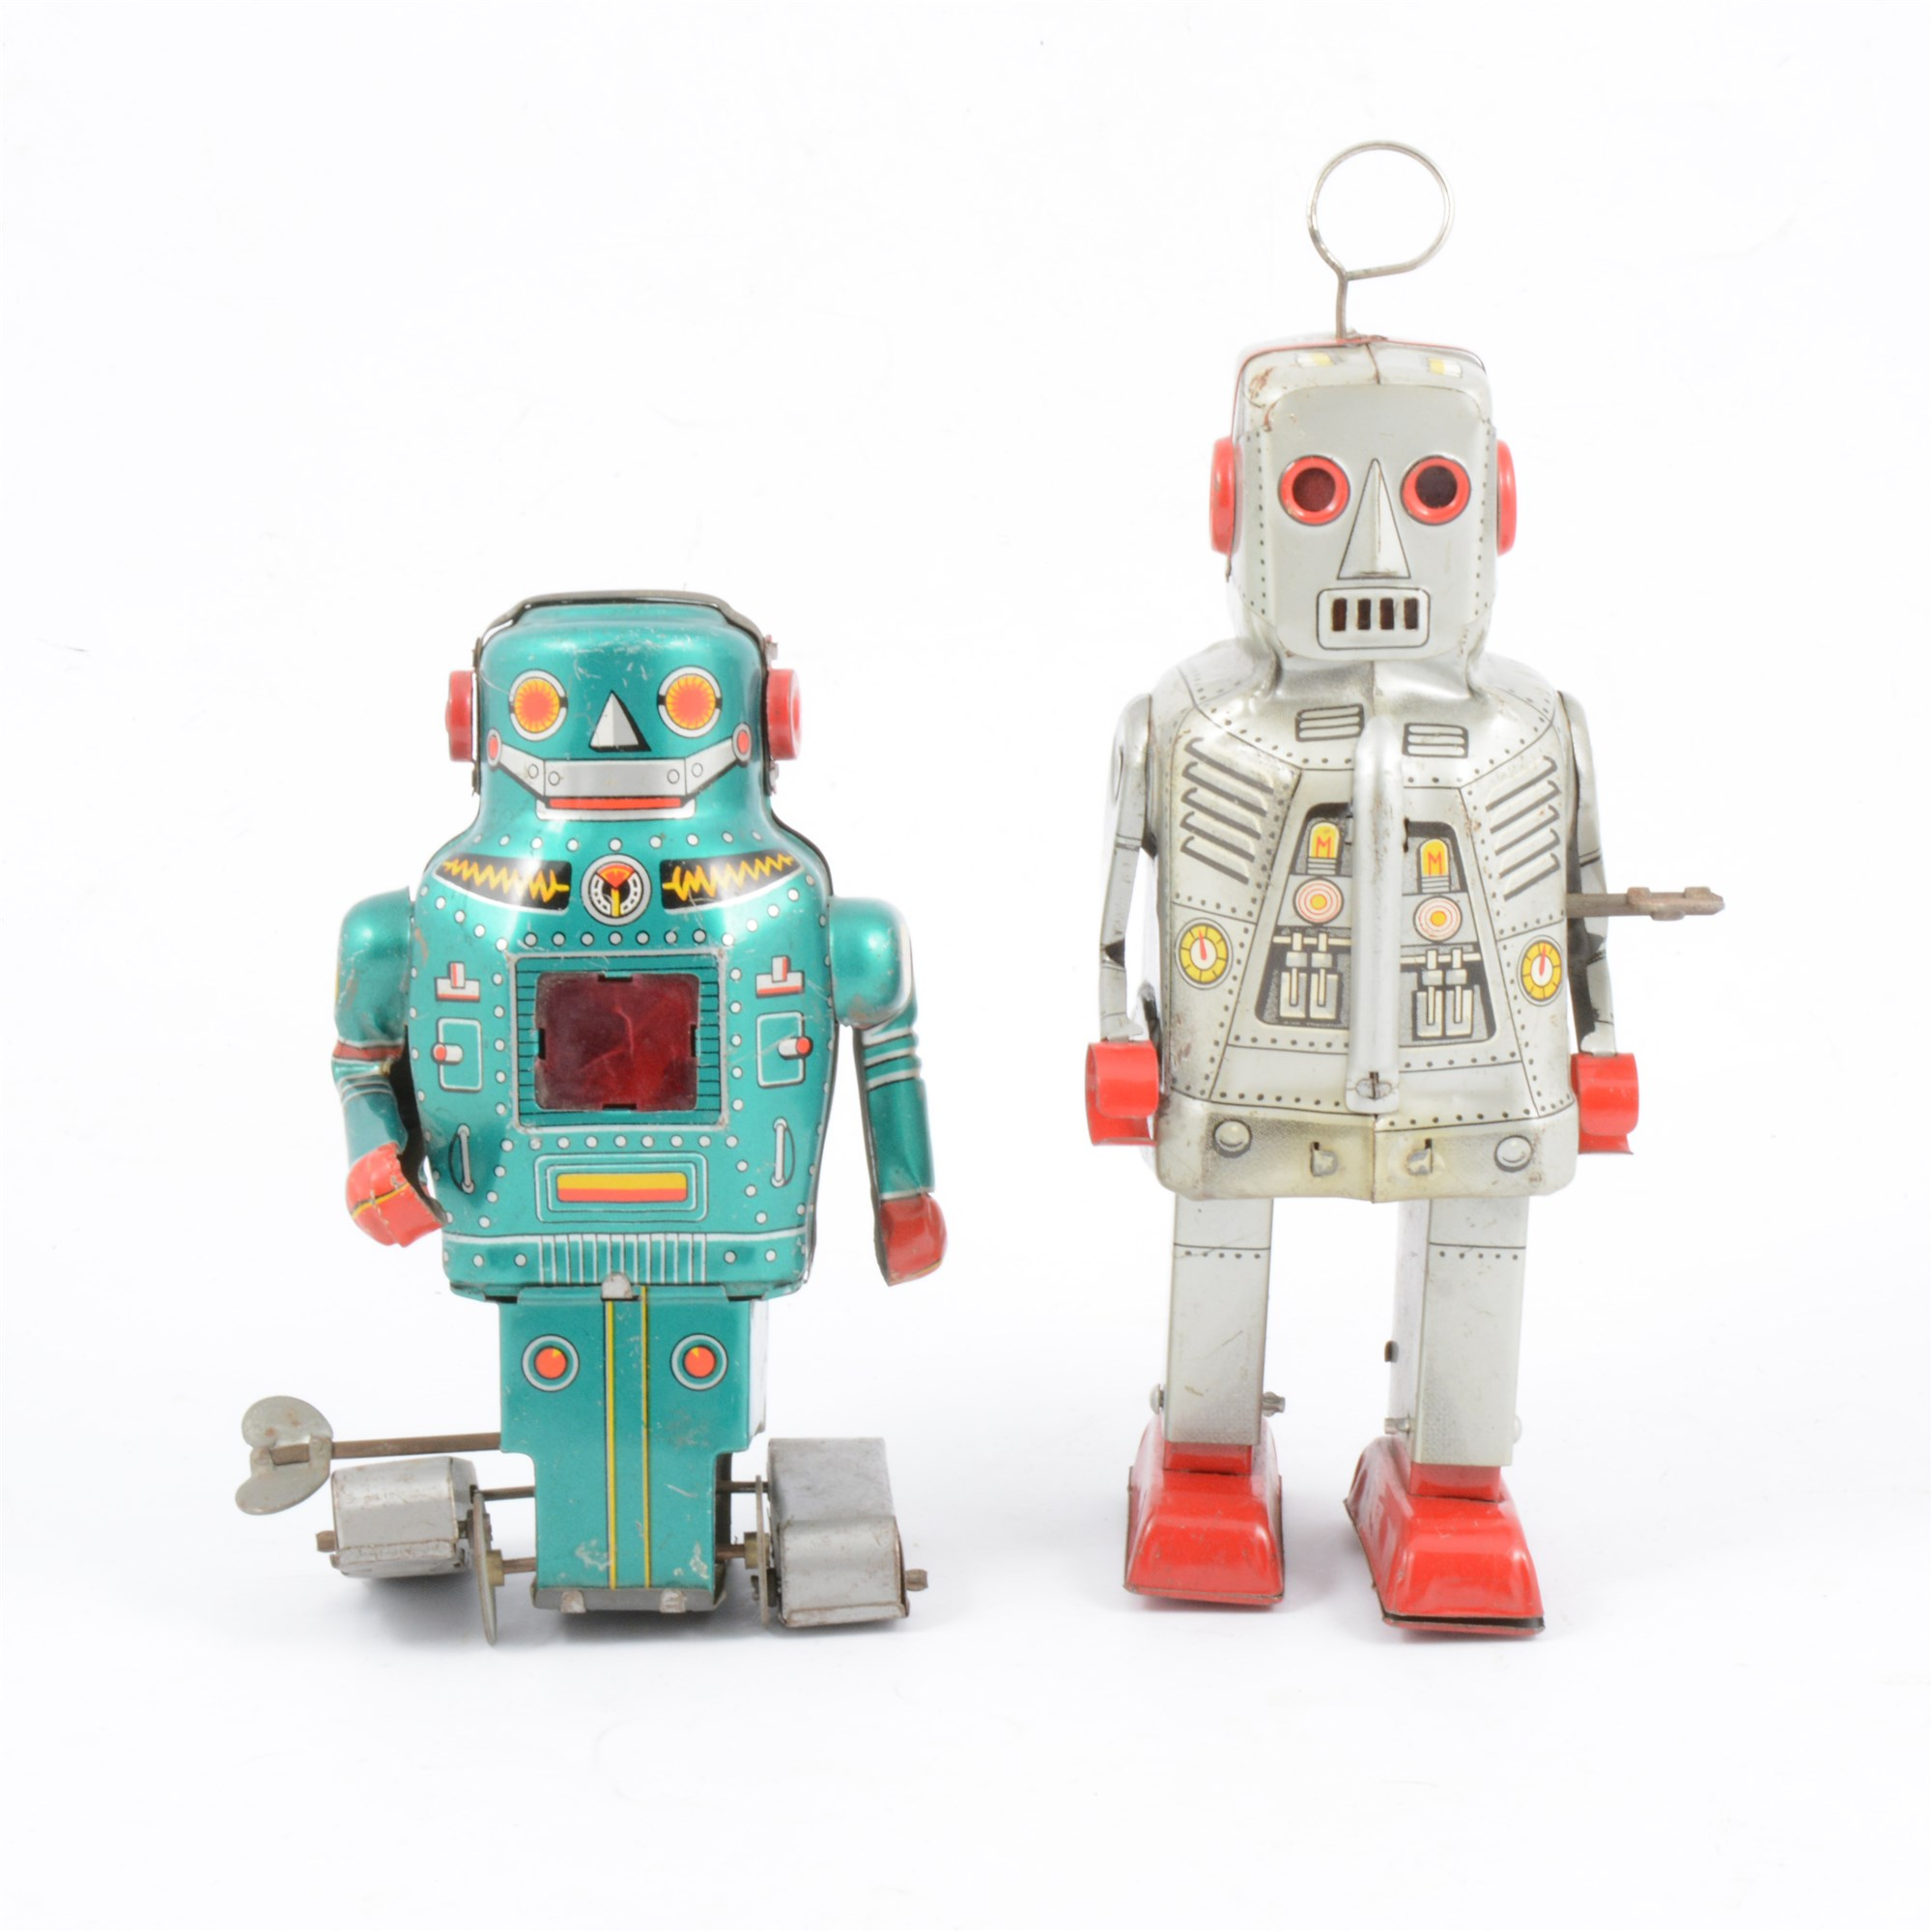 Japanese tin-plate clockwork robots